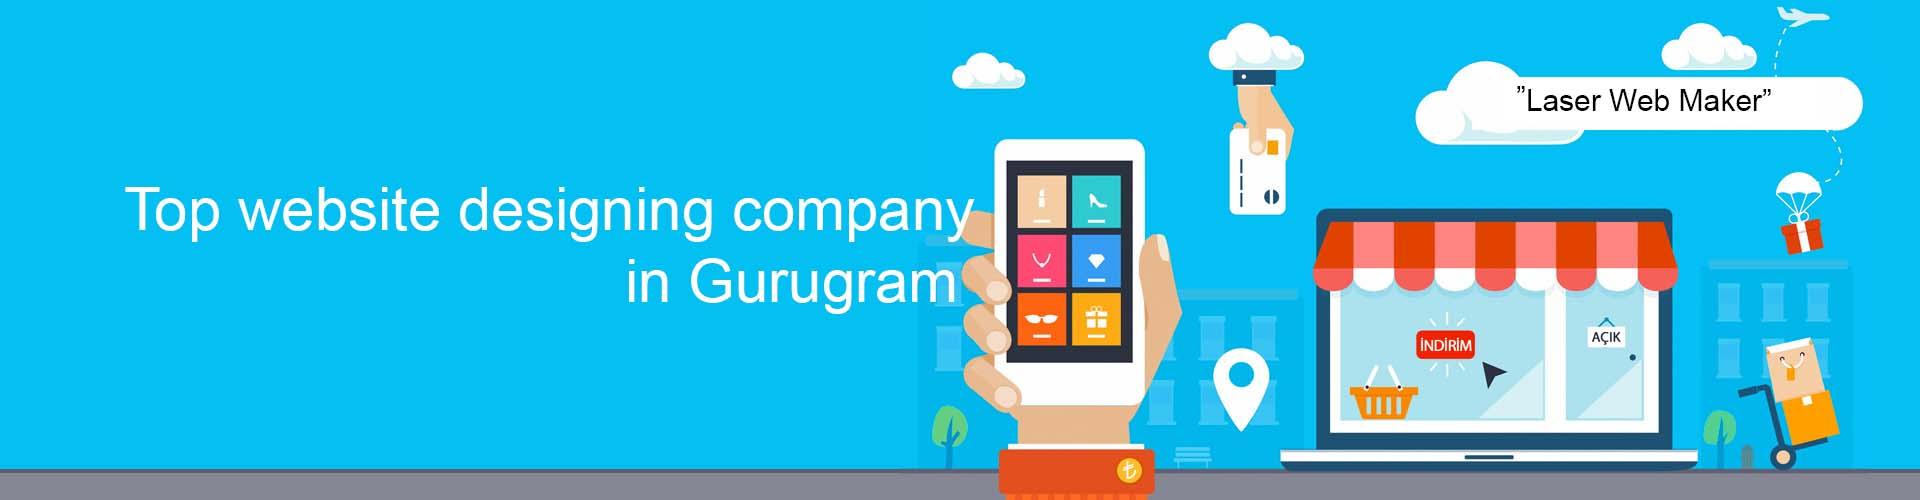 web designing company in Gurugram